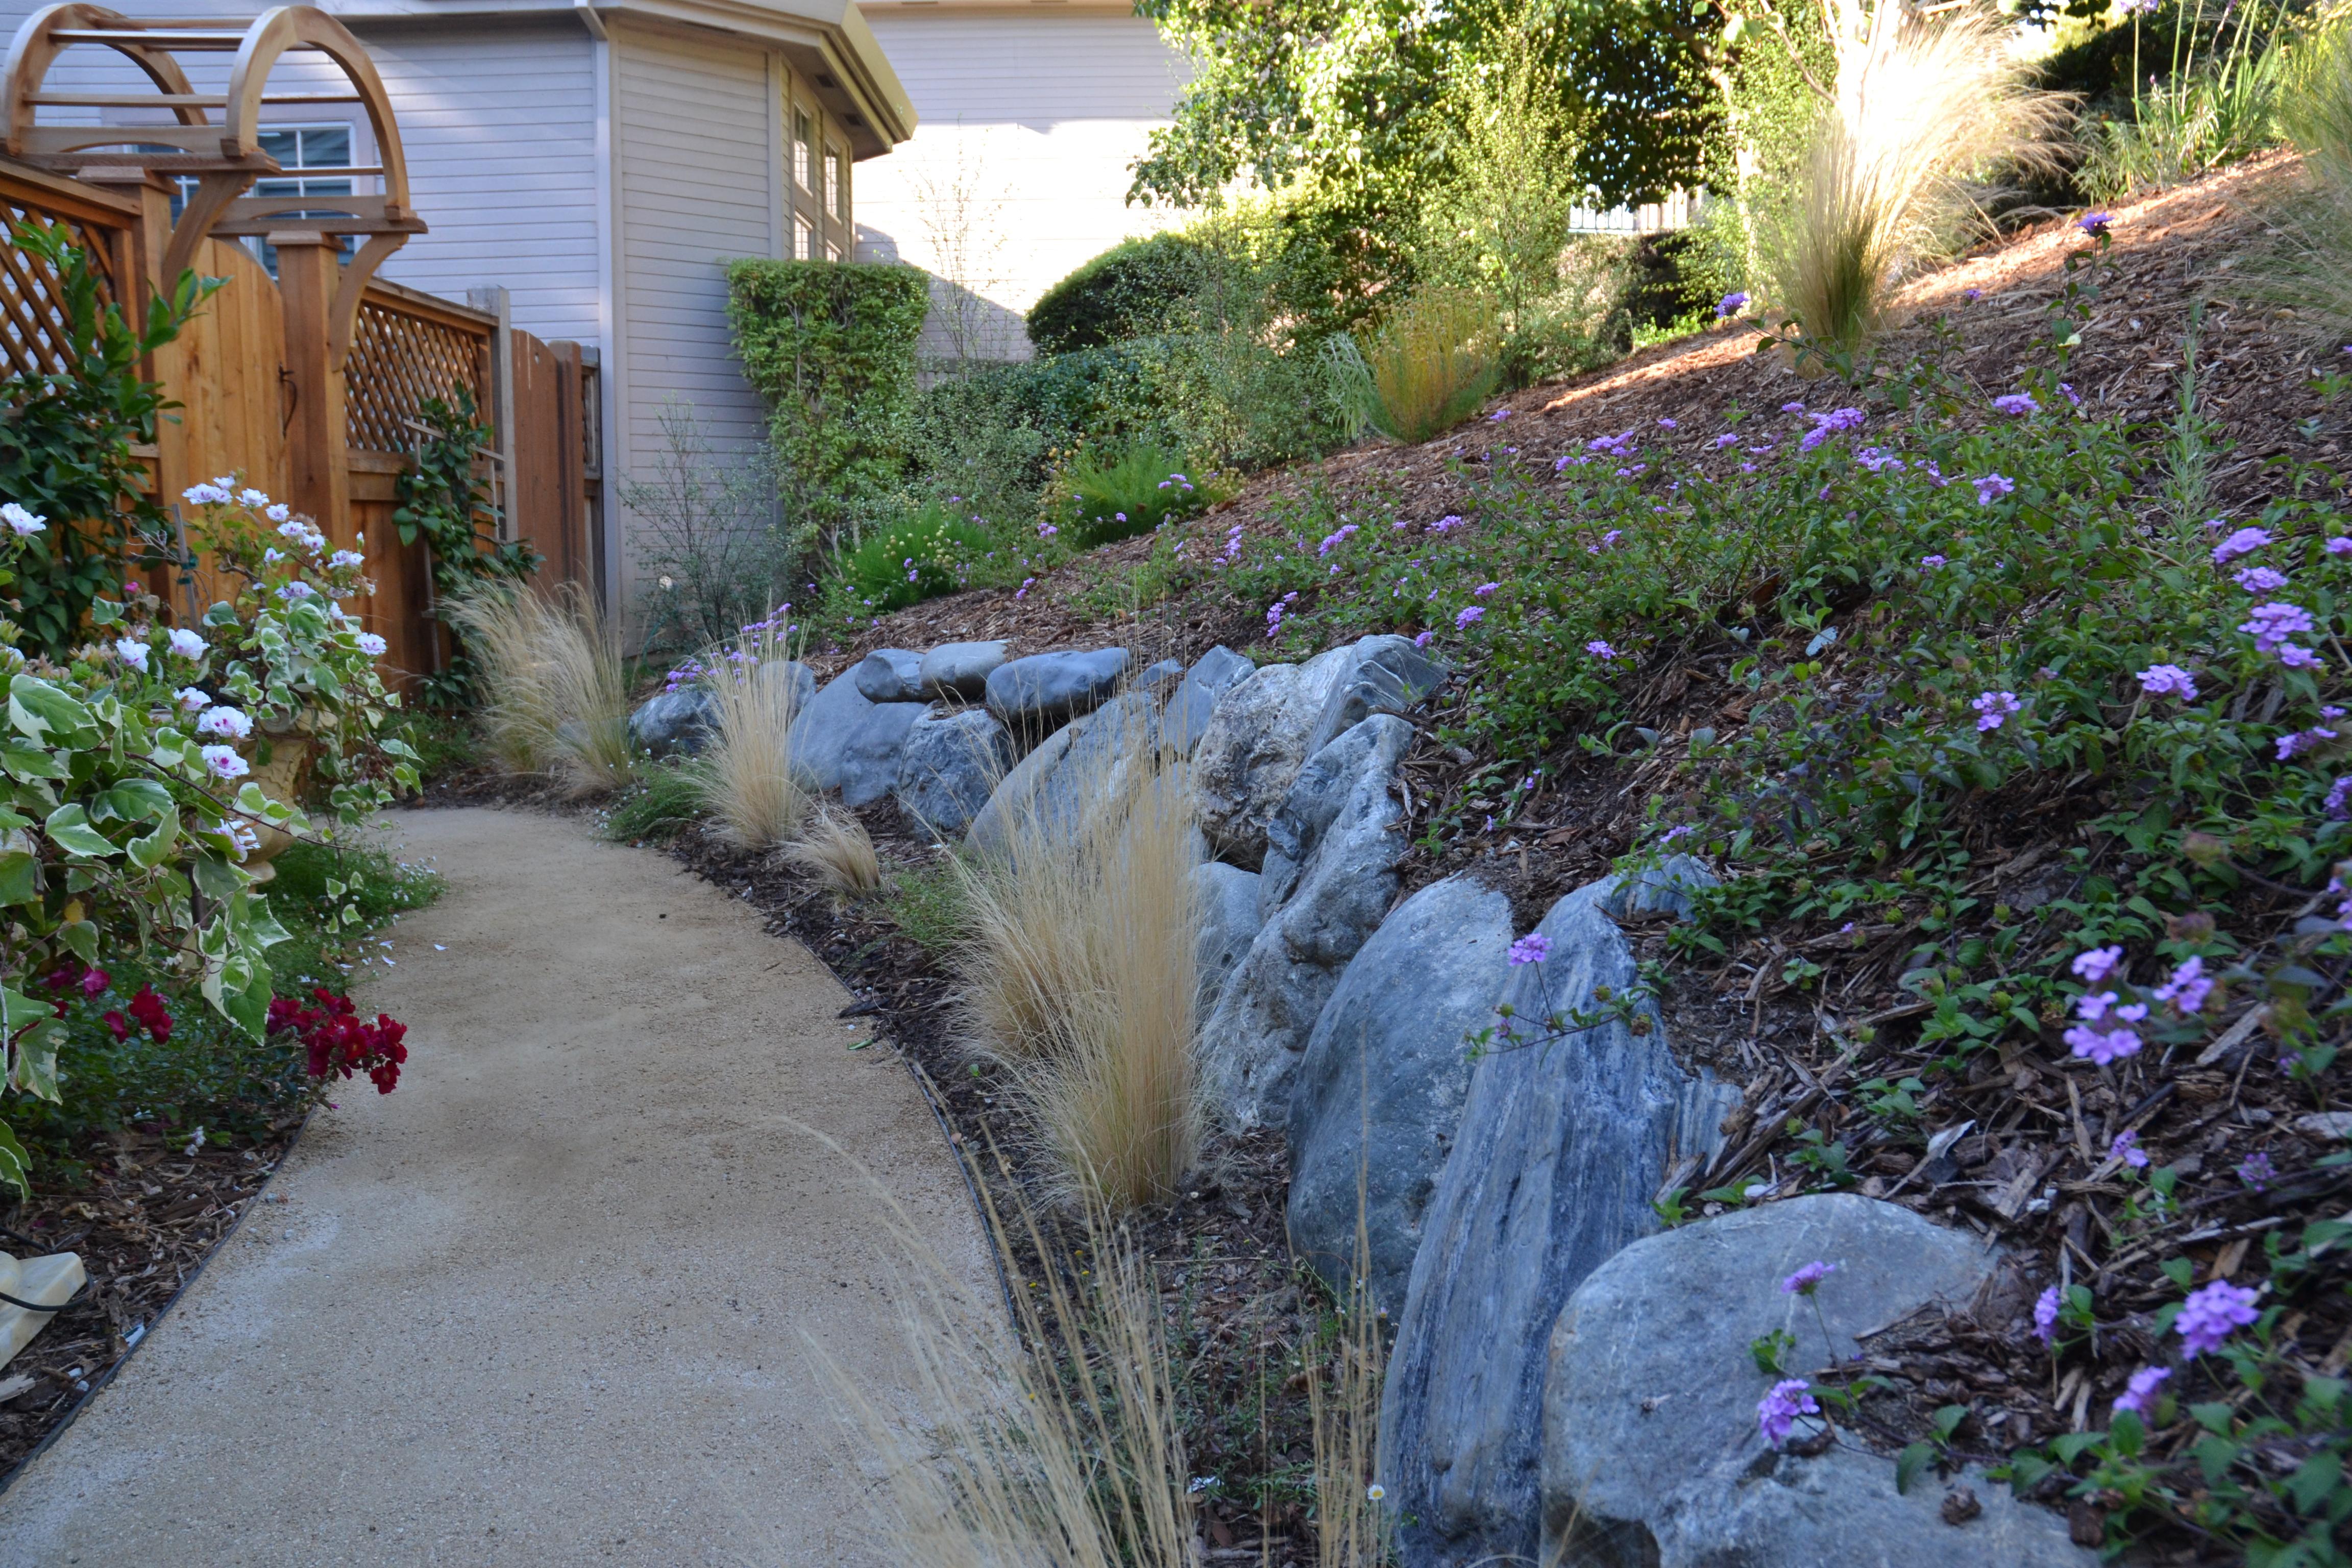 Rancho Drive, Tiburon